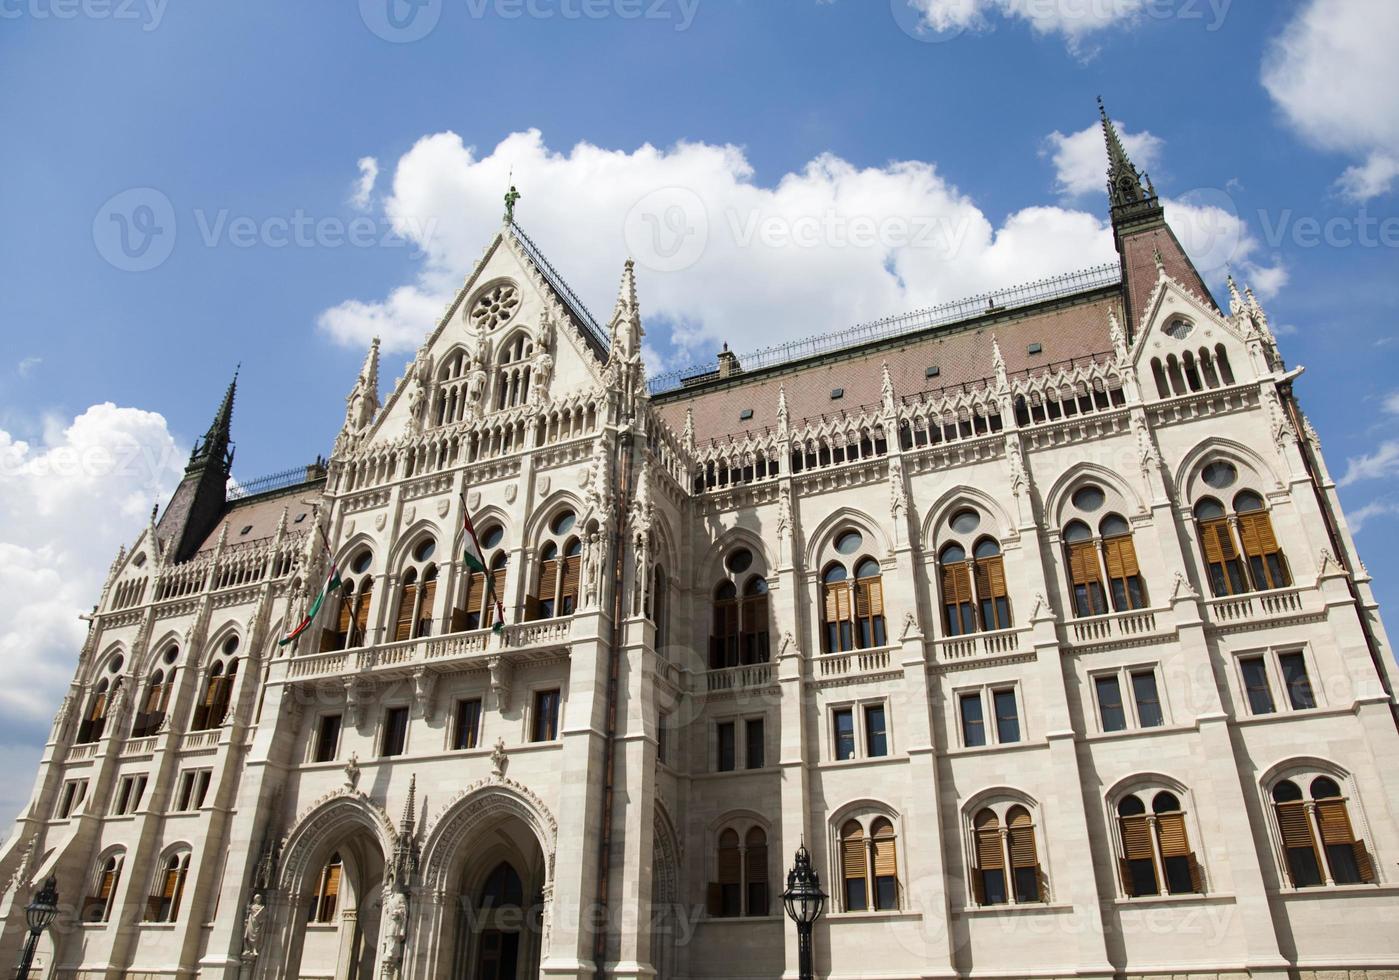 parlamentsbyggnad i budapest foto